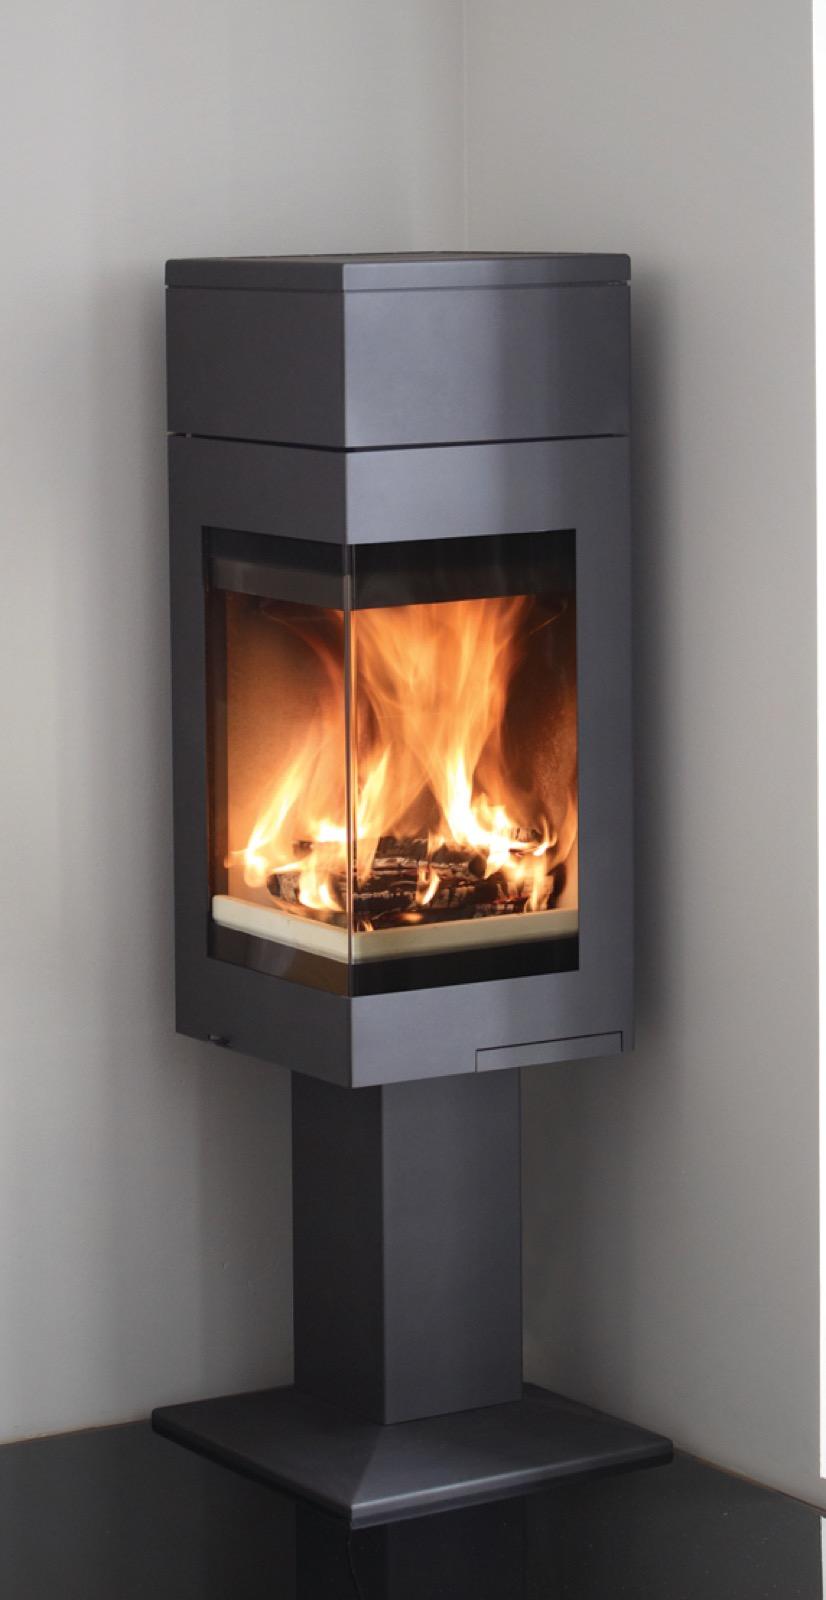 Nordpeis Quadro 1t Wood Burning Stove With Pedestal Base